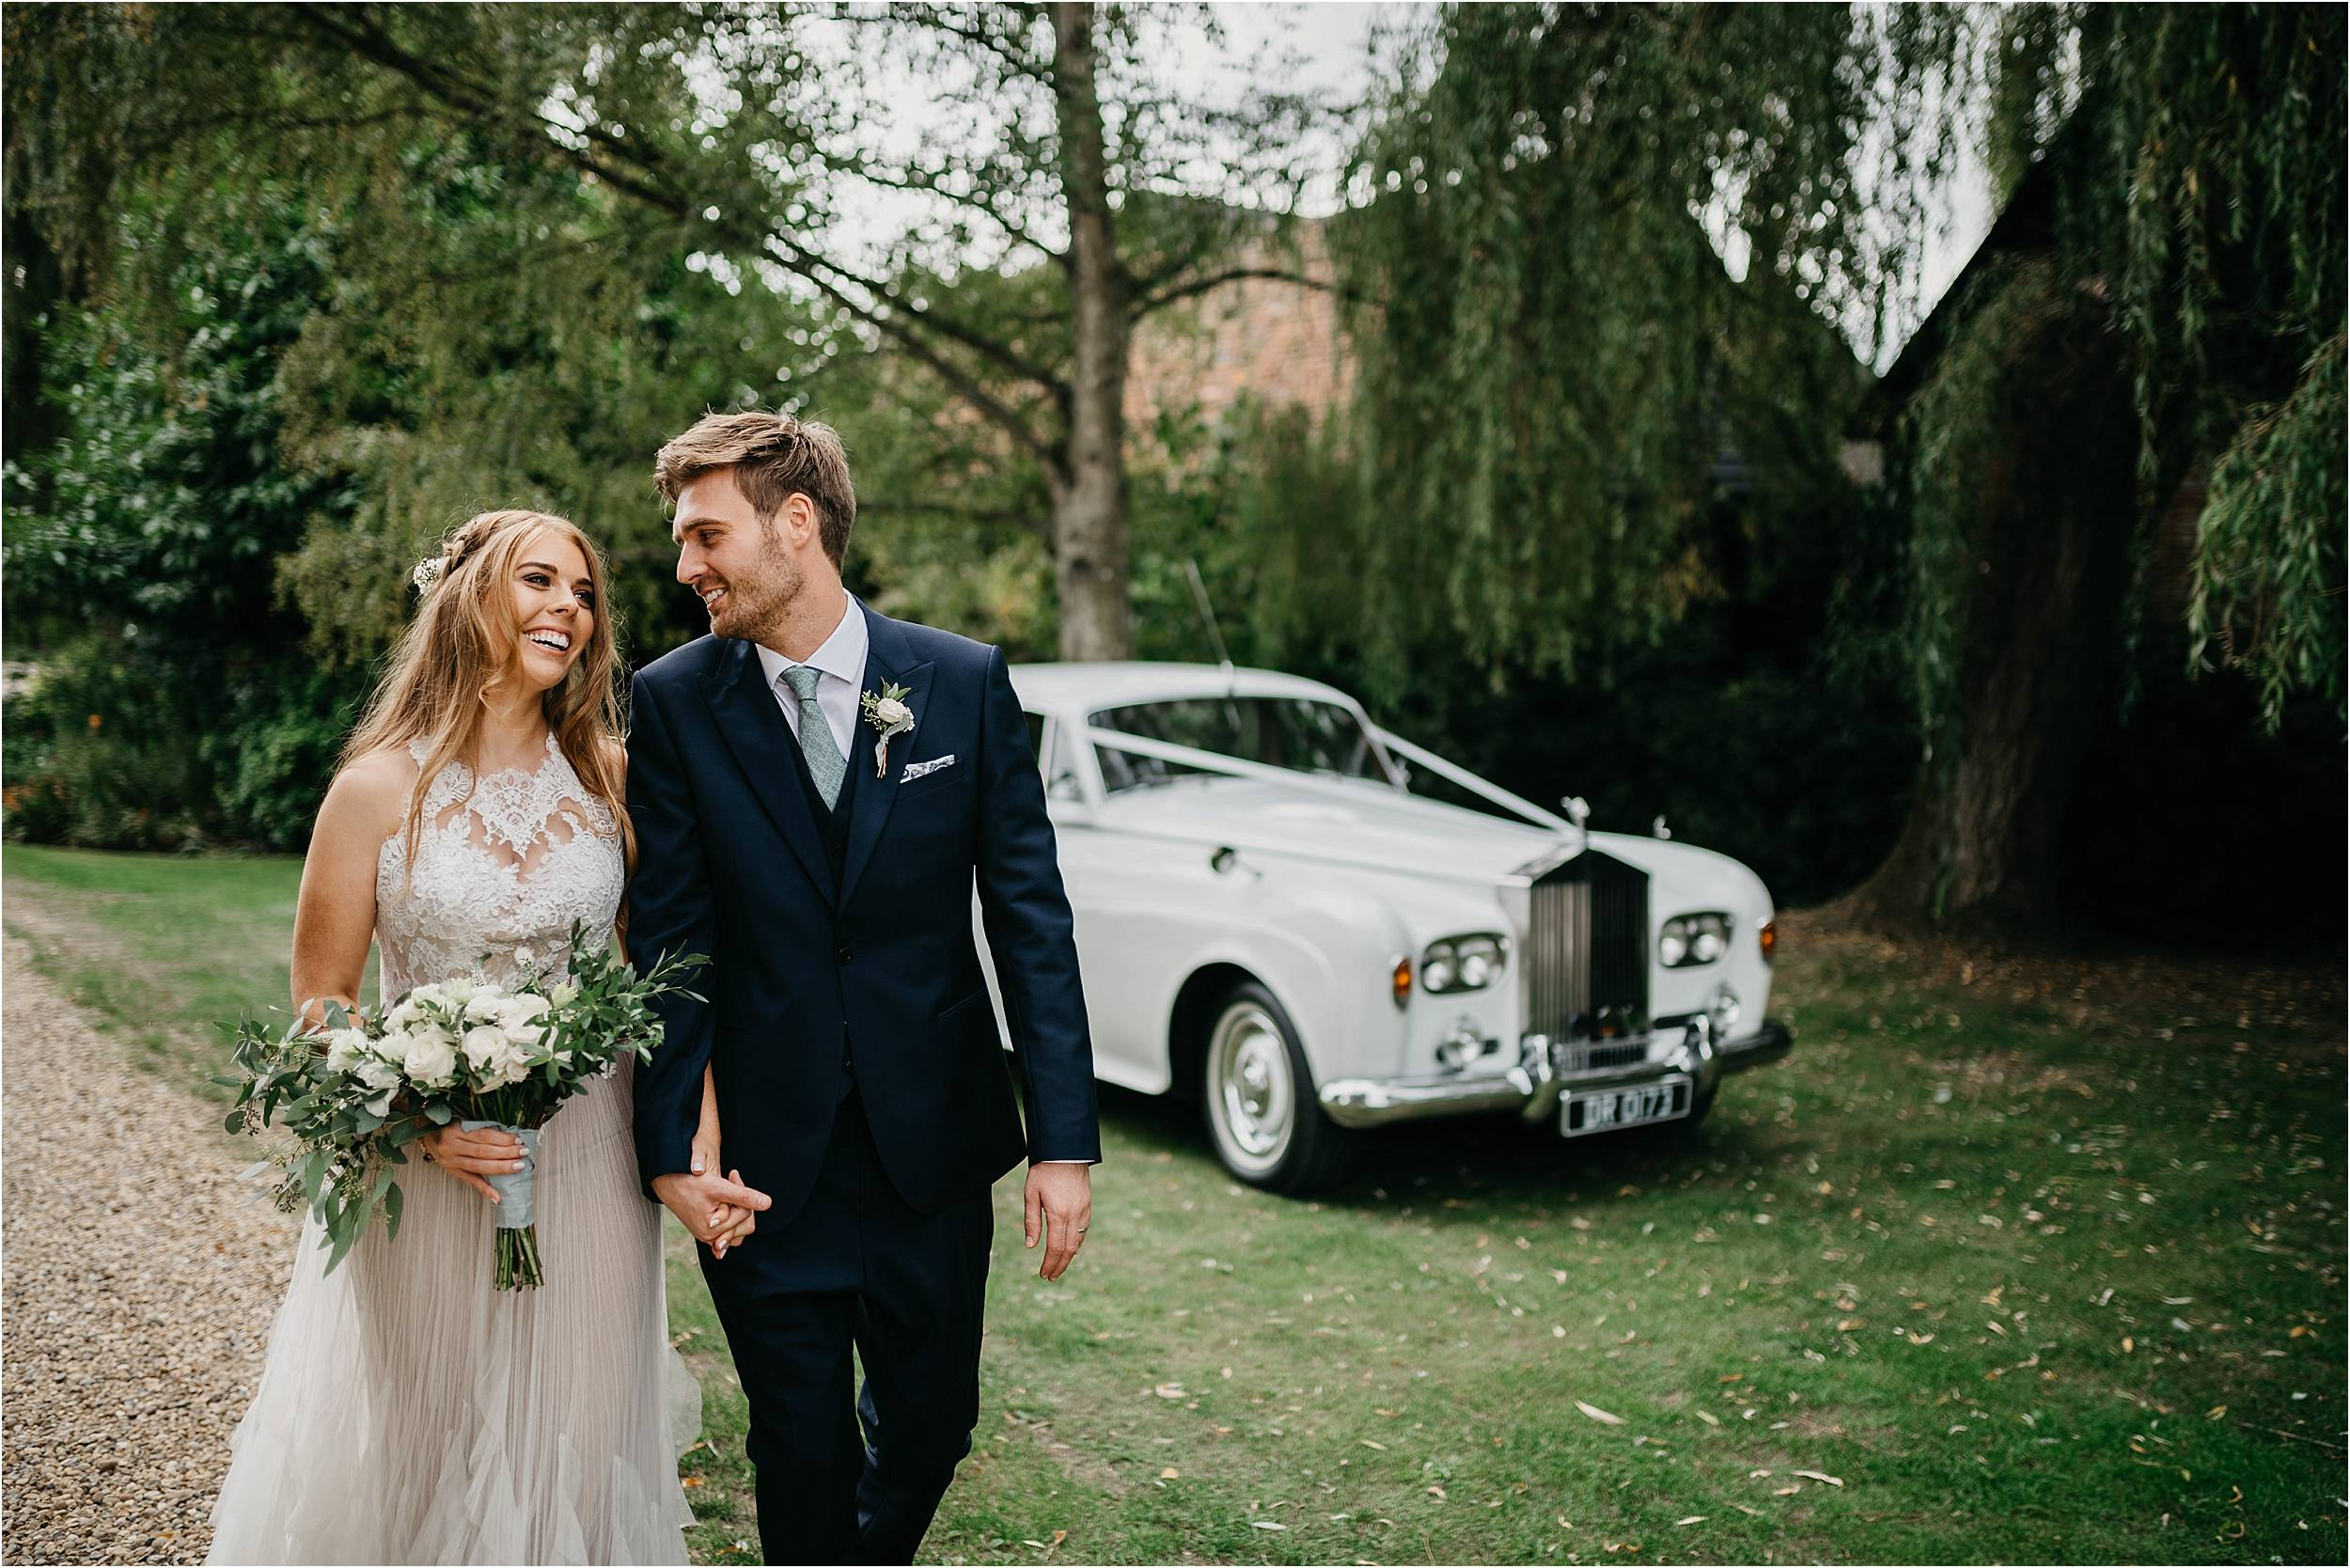 The Priory Little Wymondley Wedding Photography_0092.jpg